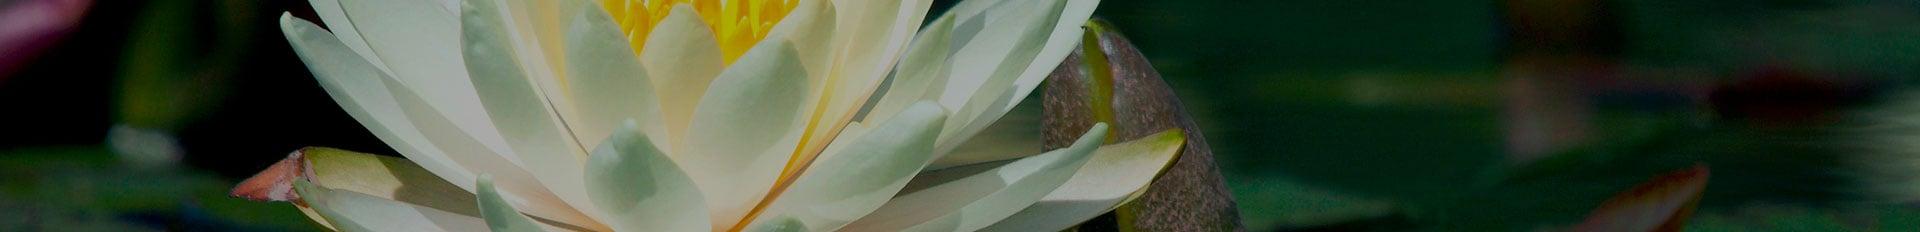 Resources | Samart-Mothe Funeral Home